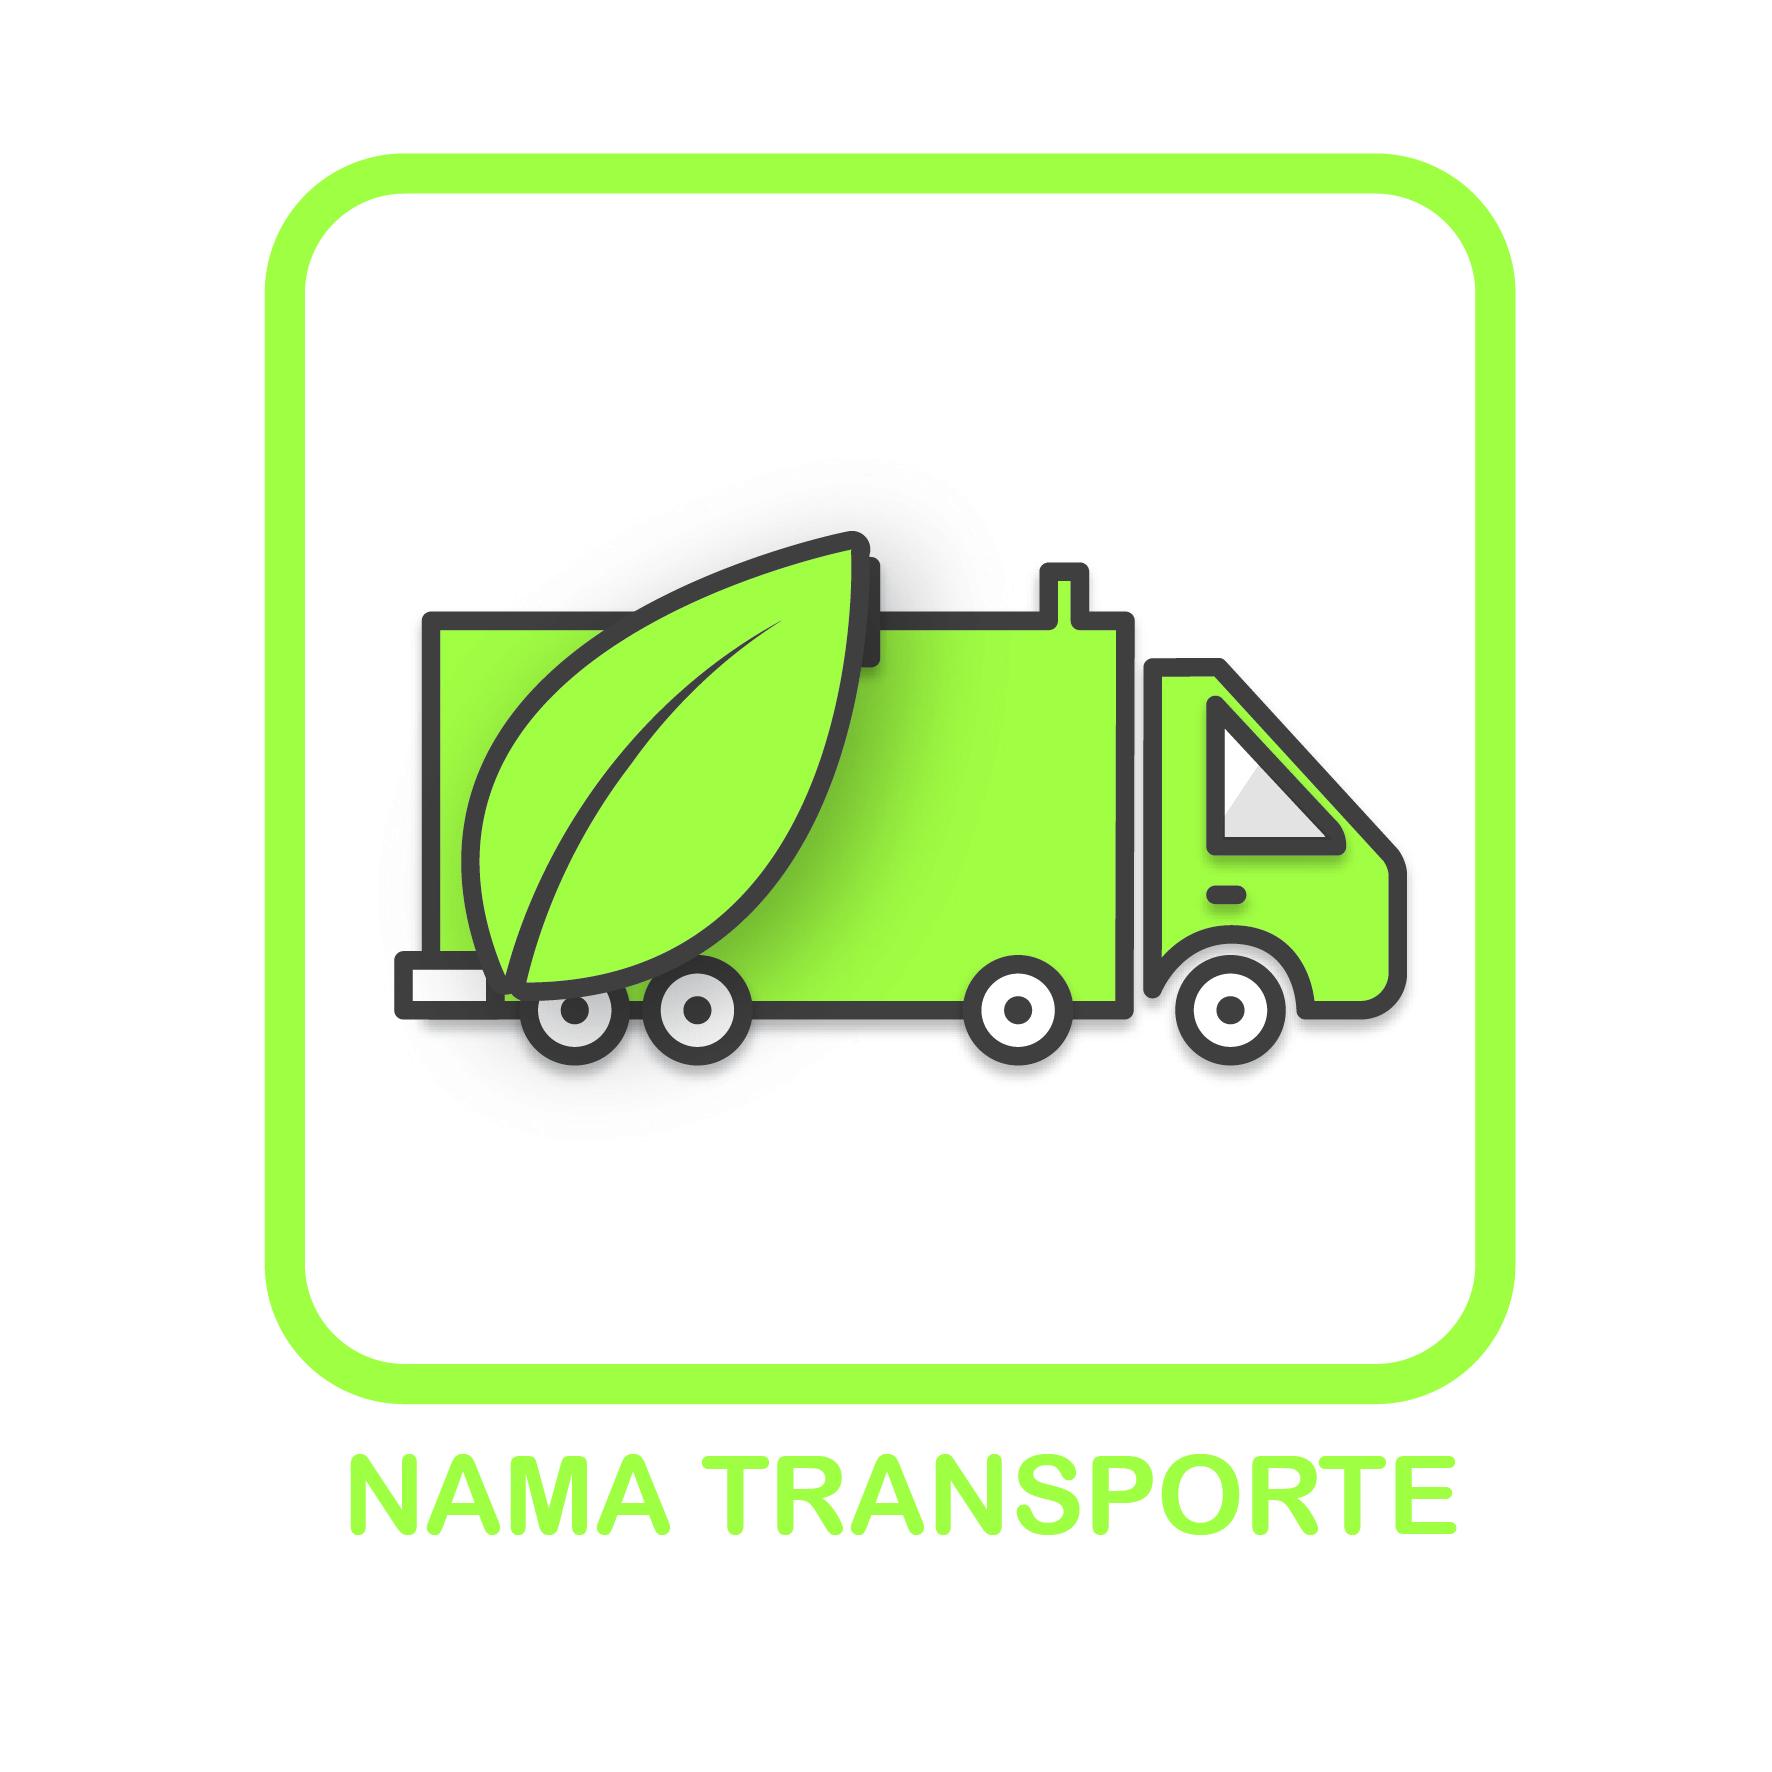 Icon of 03 NAMA Transporte